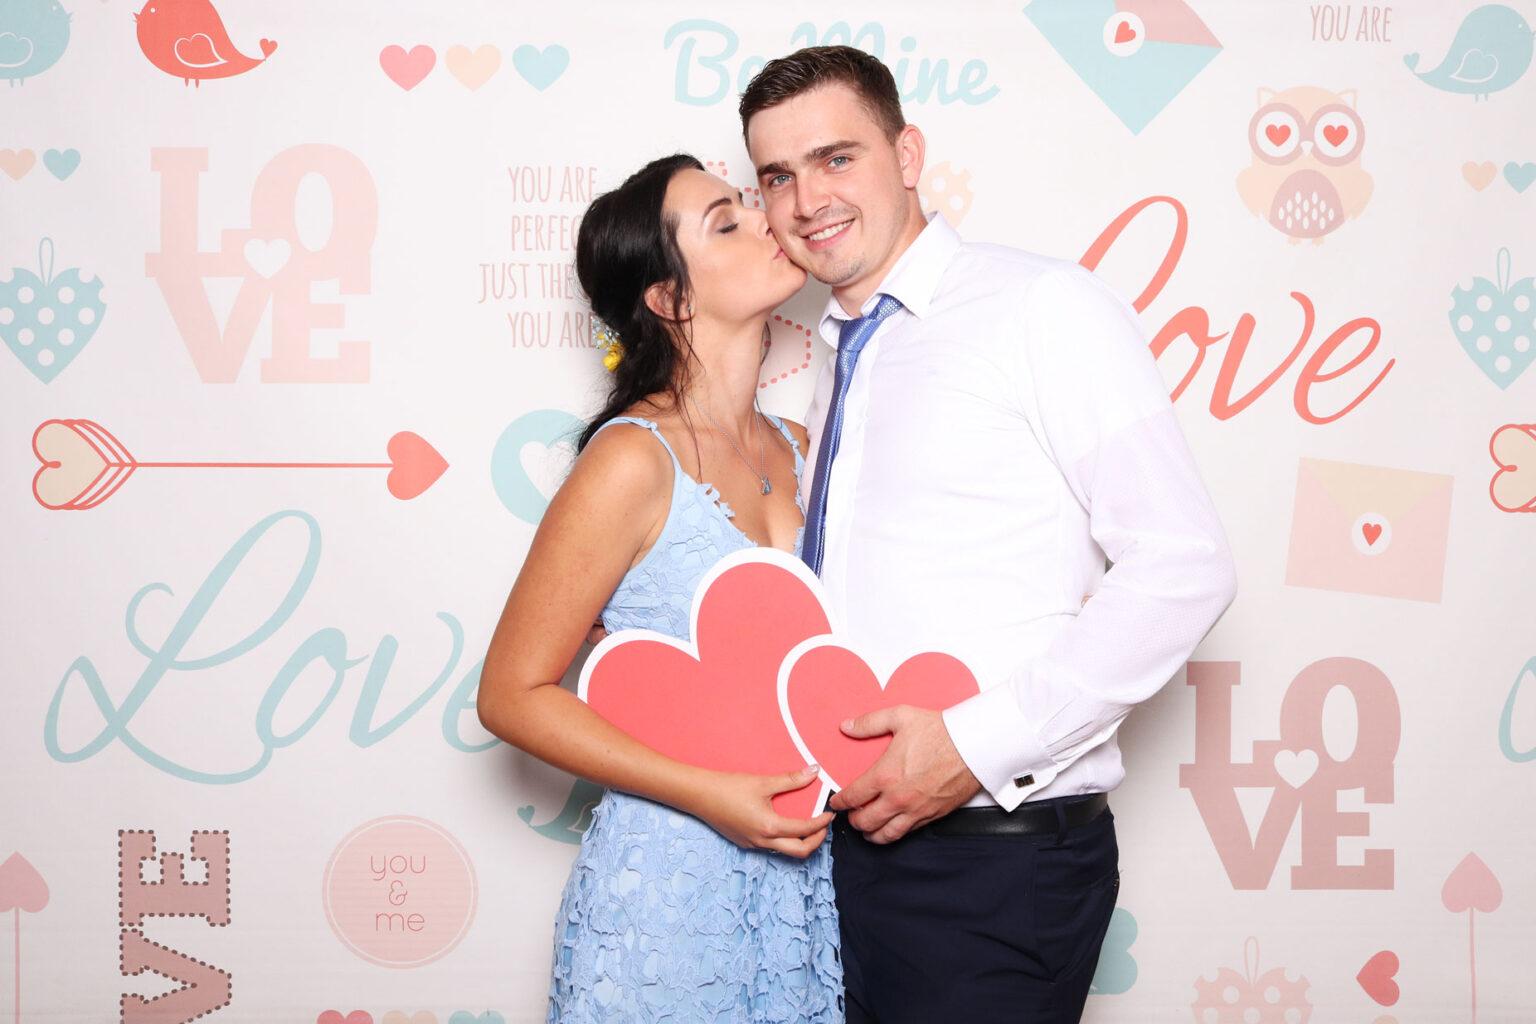 Pozadie Love - svadba fotokutik - fotostena.